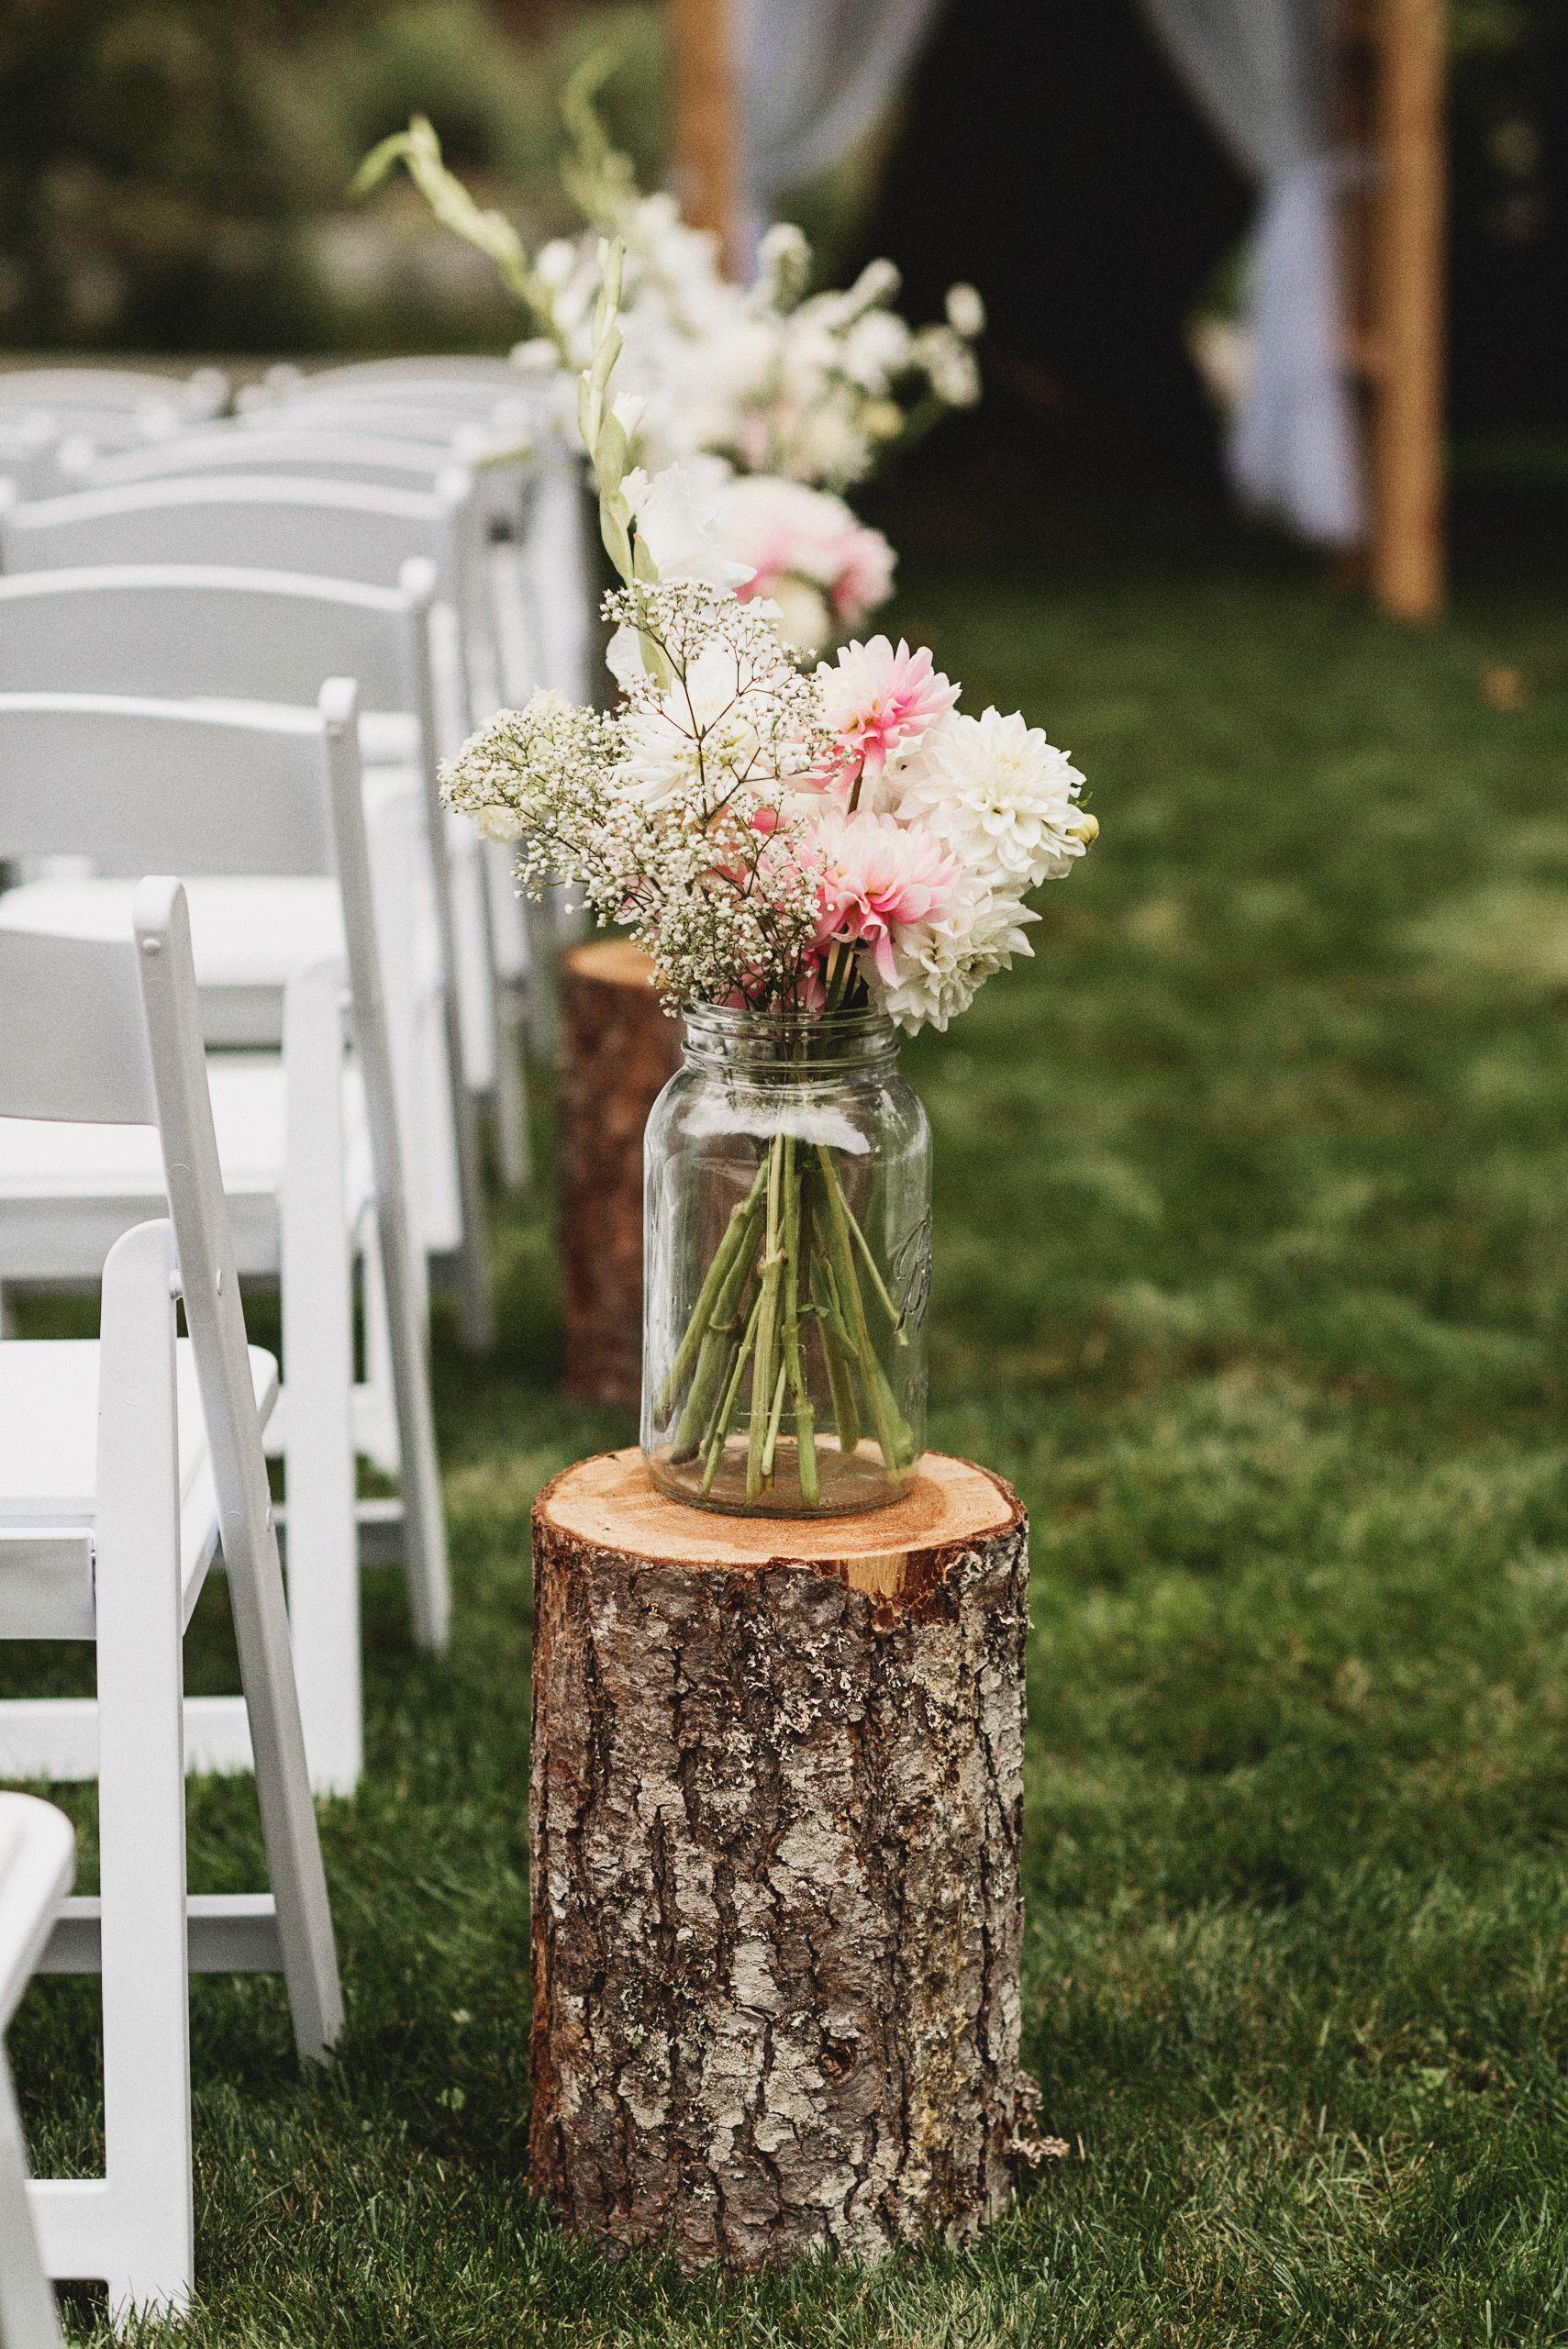 Country Vintage Wedding Wedding aisle decorations